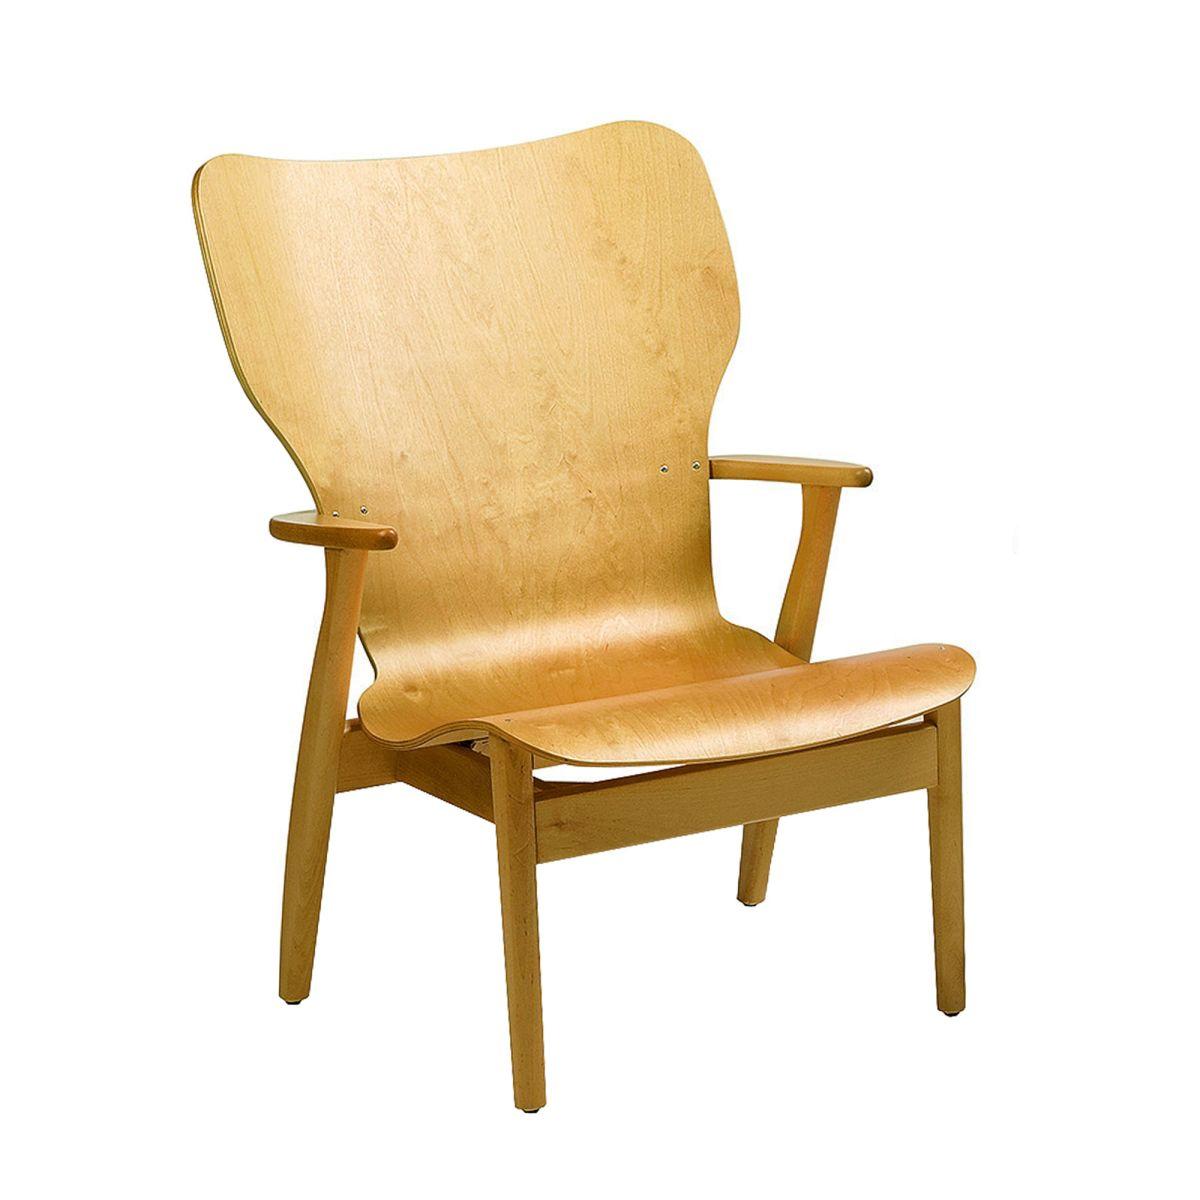 Domus-Lounge-Chair-Birch